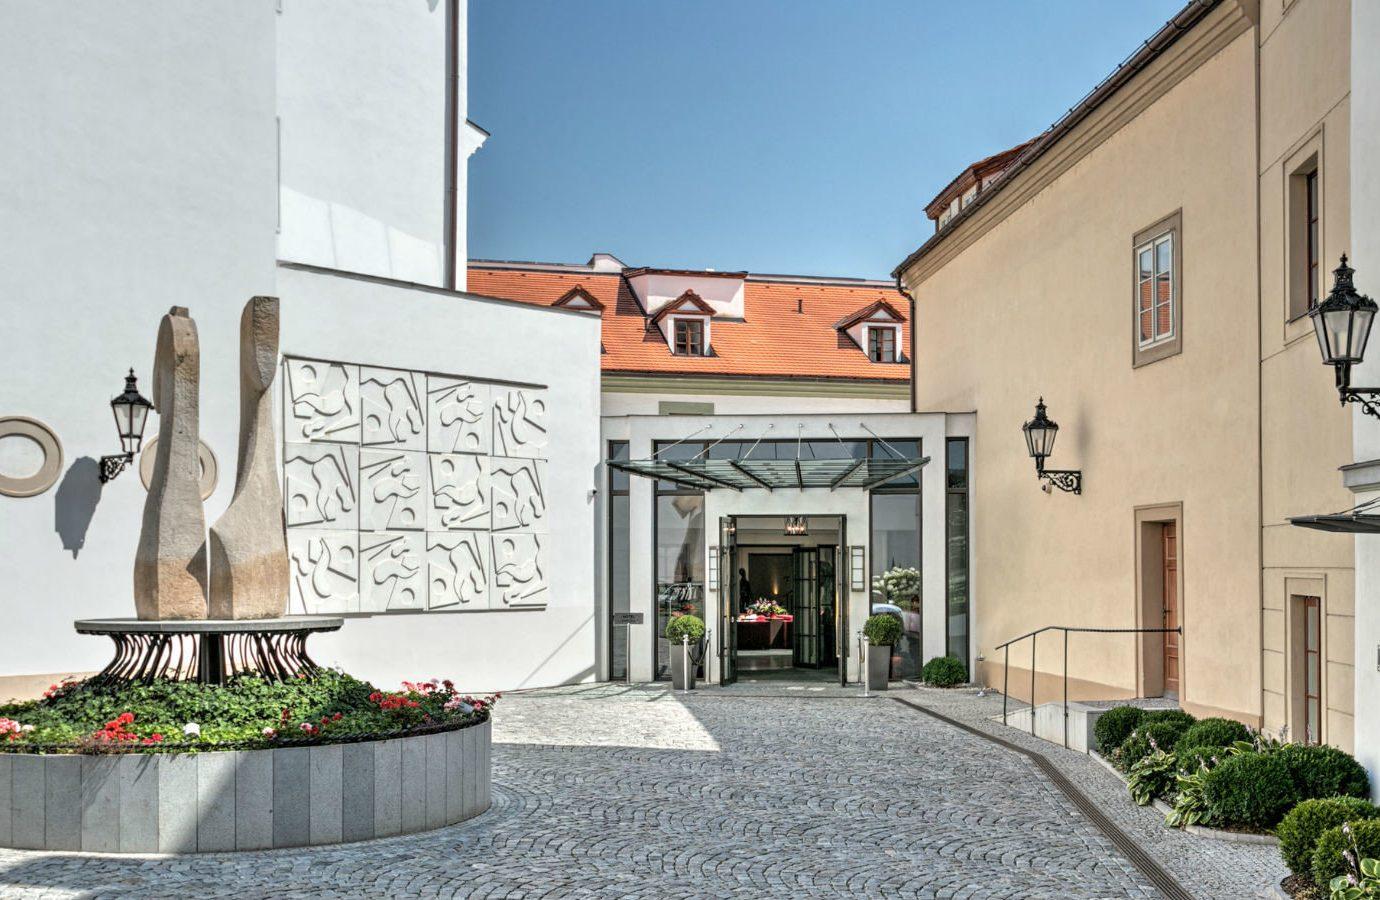 europe Hotels Prague property neighbourhood real estate facade building estate window house Courtyard hacienda